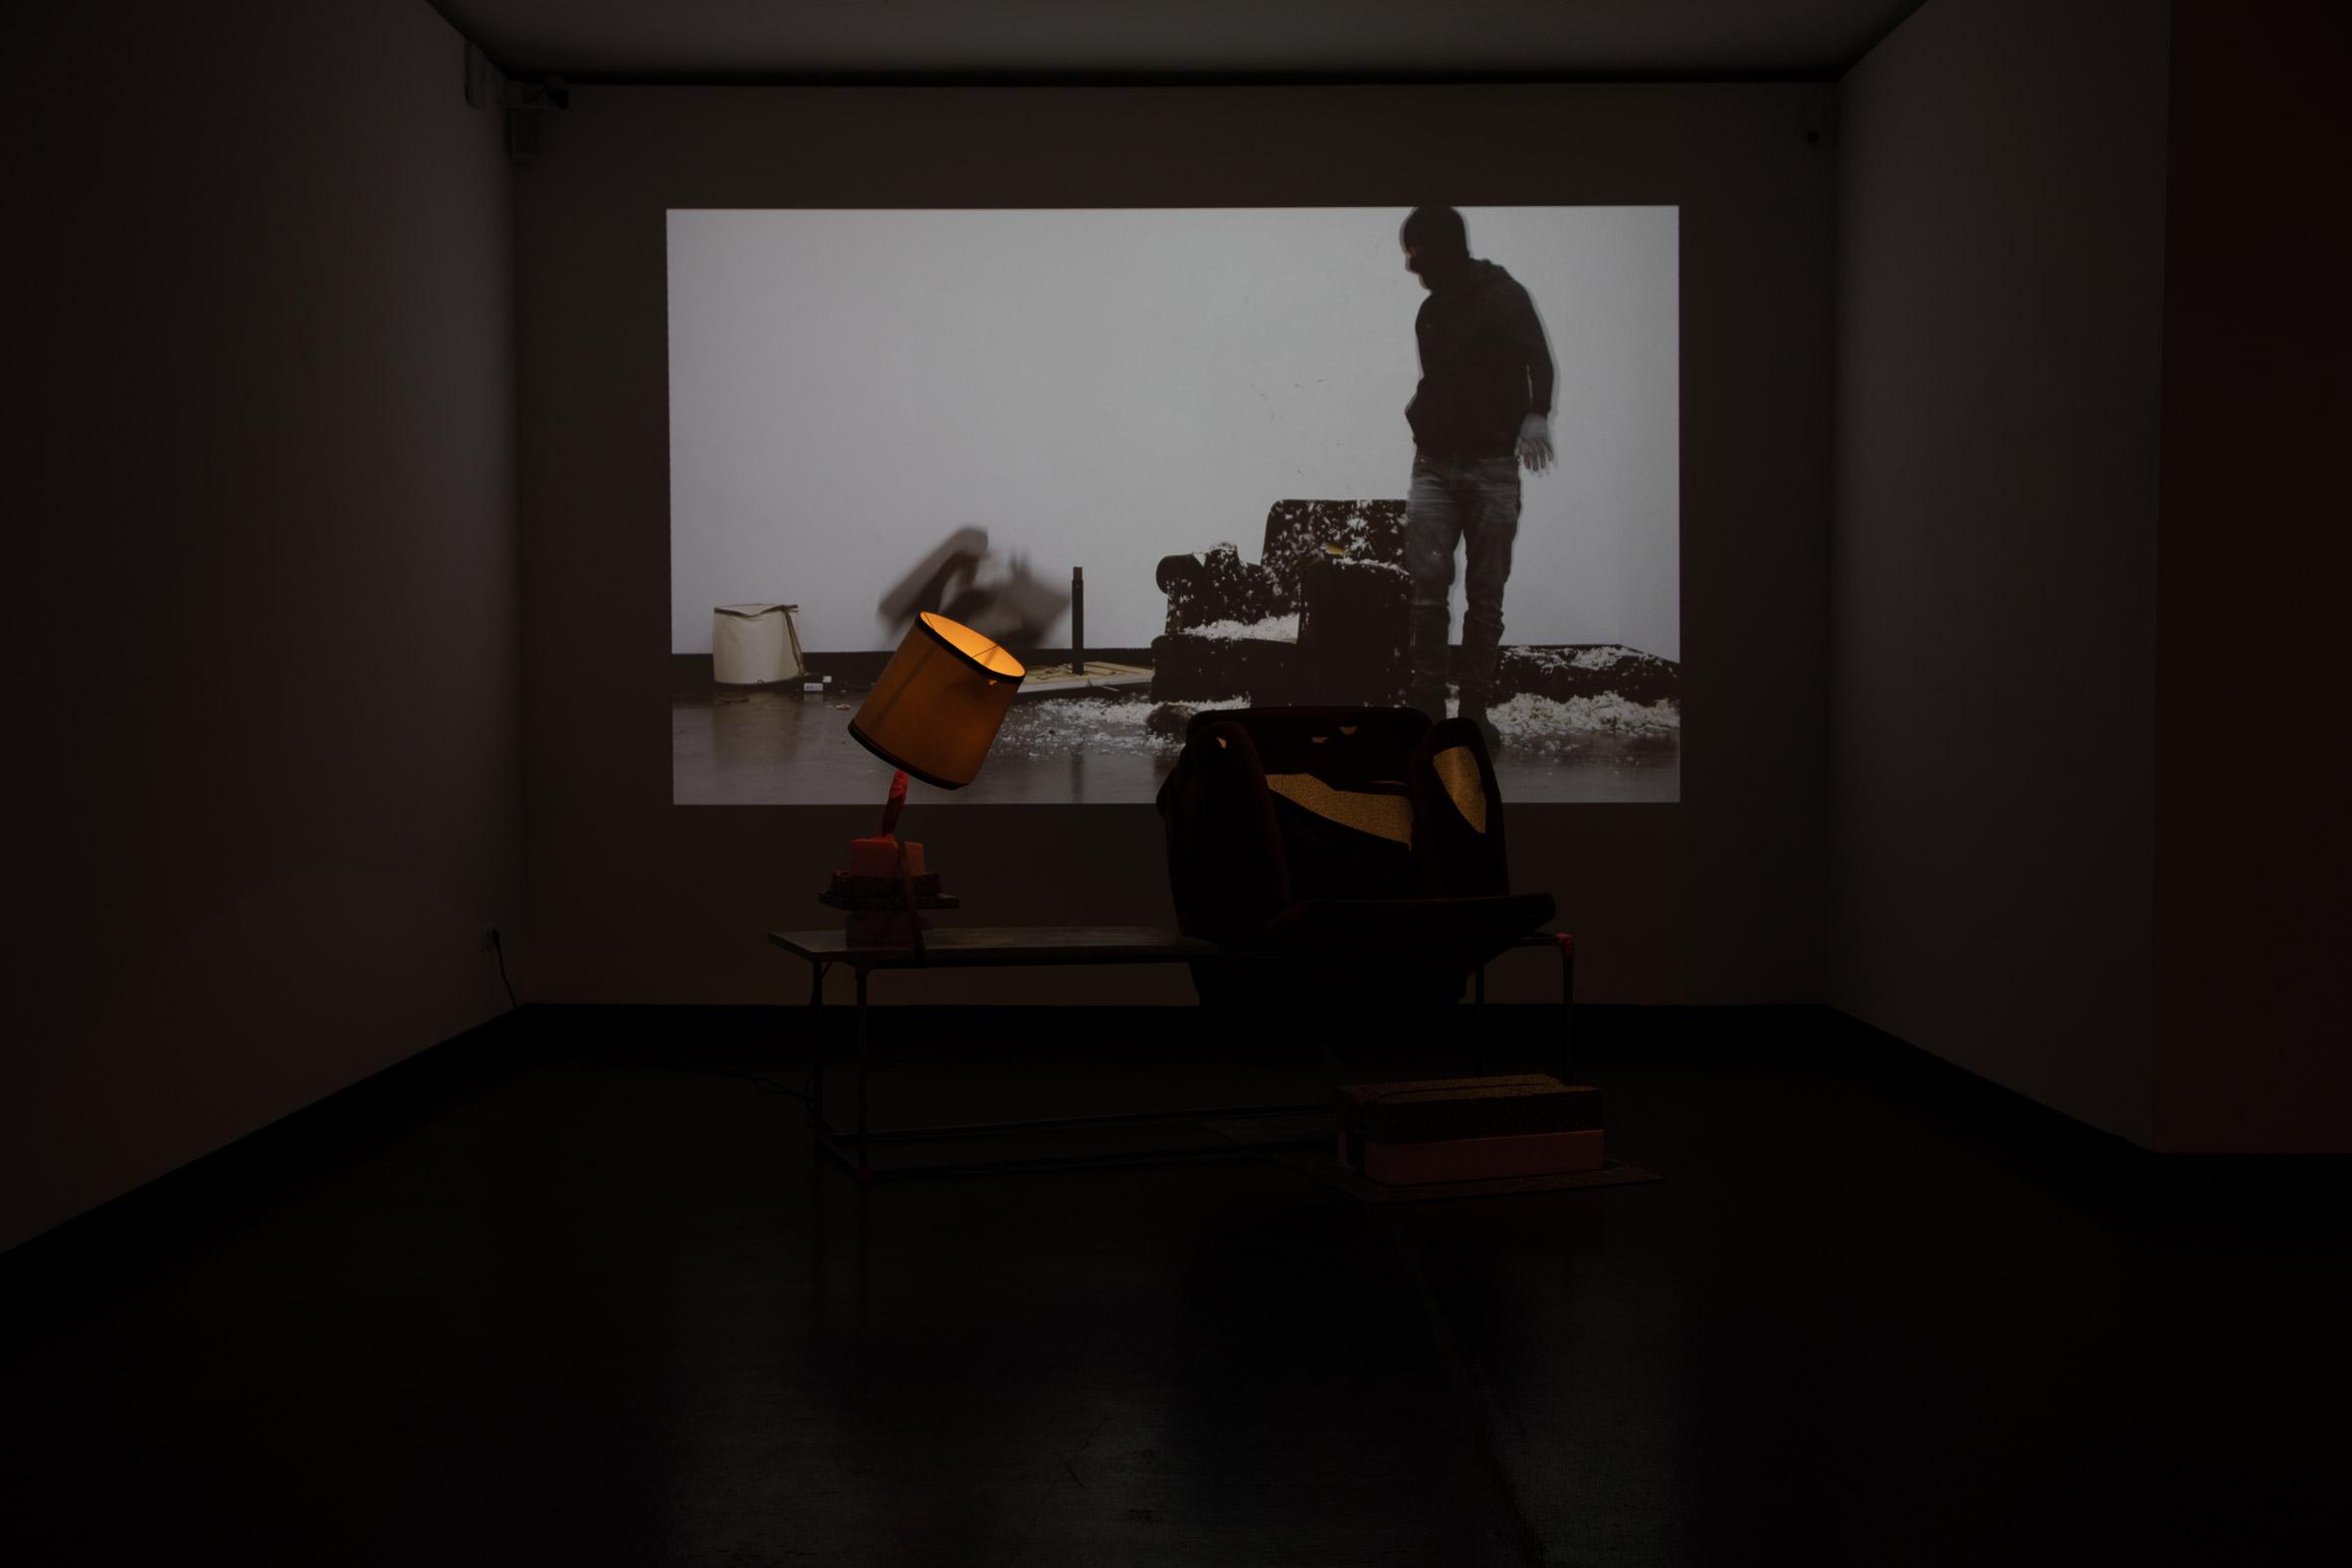 Pablo Chiereghin destroying furniture